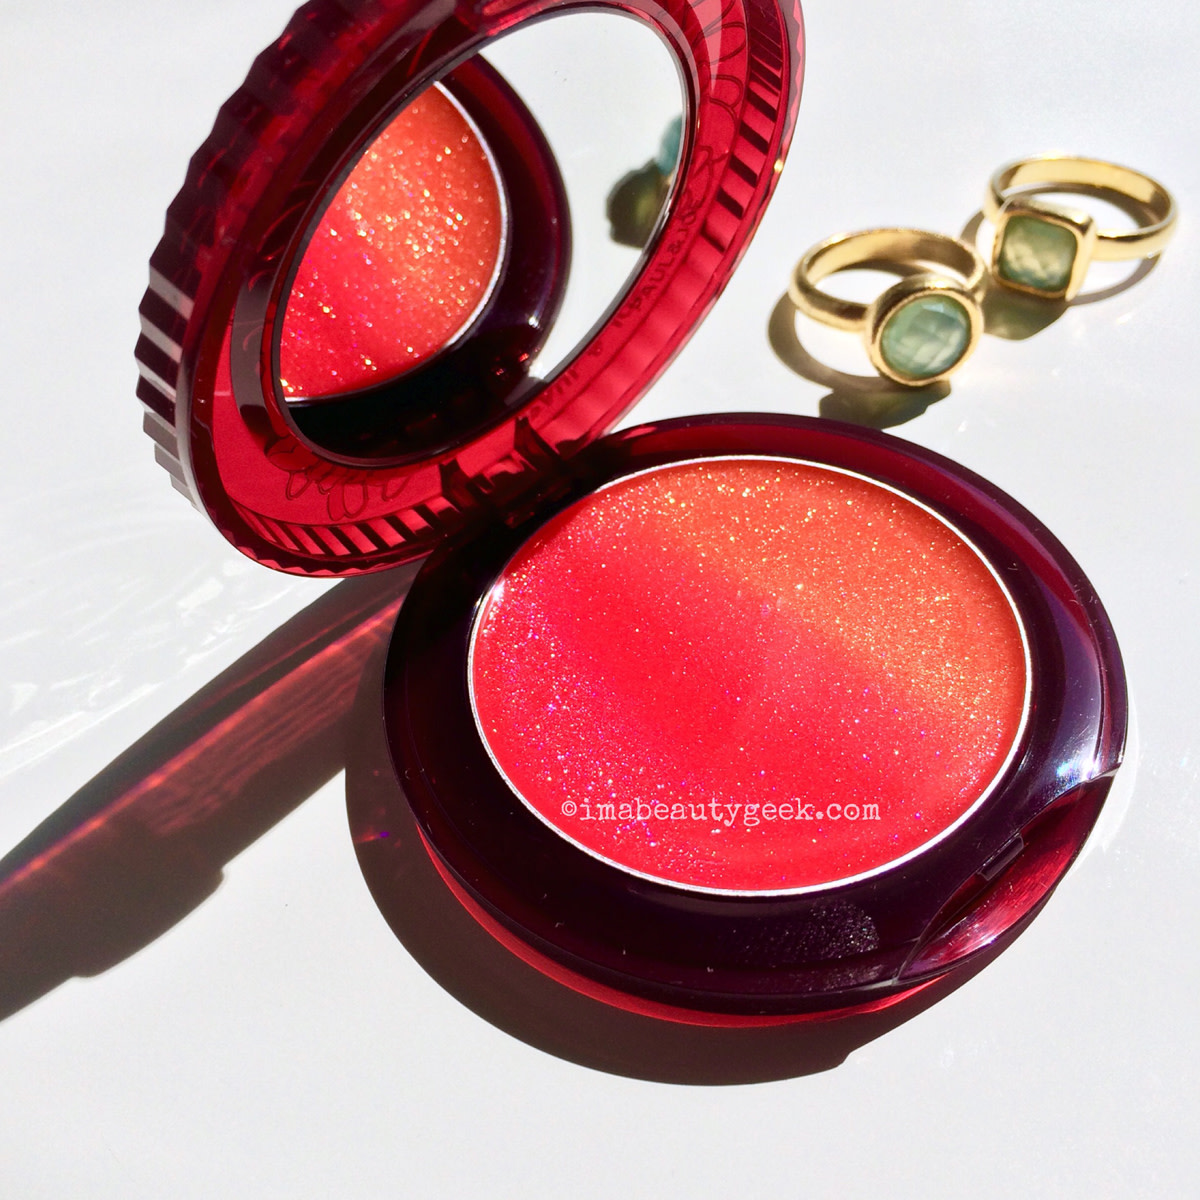 Summer lip gloss: Paul & Joe Midnight Sangria lip gloss M 03Sanguinello